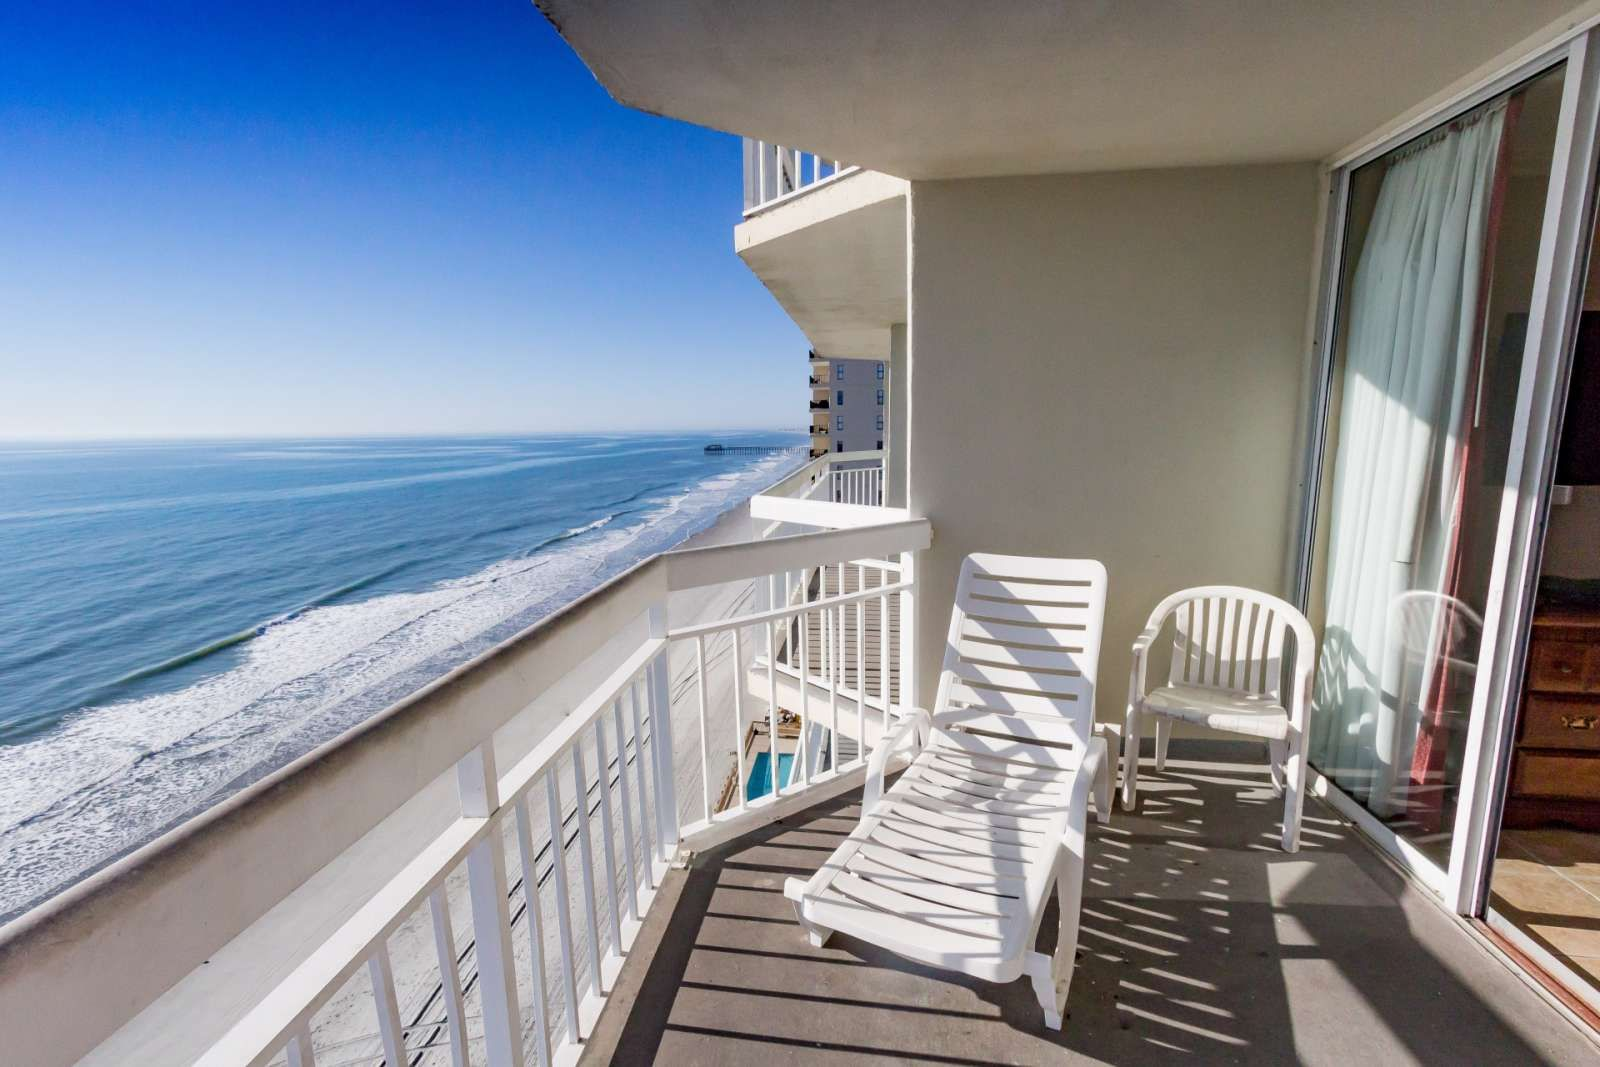 Murrells inlet vacation rental waters edge 1211 free